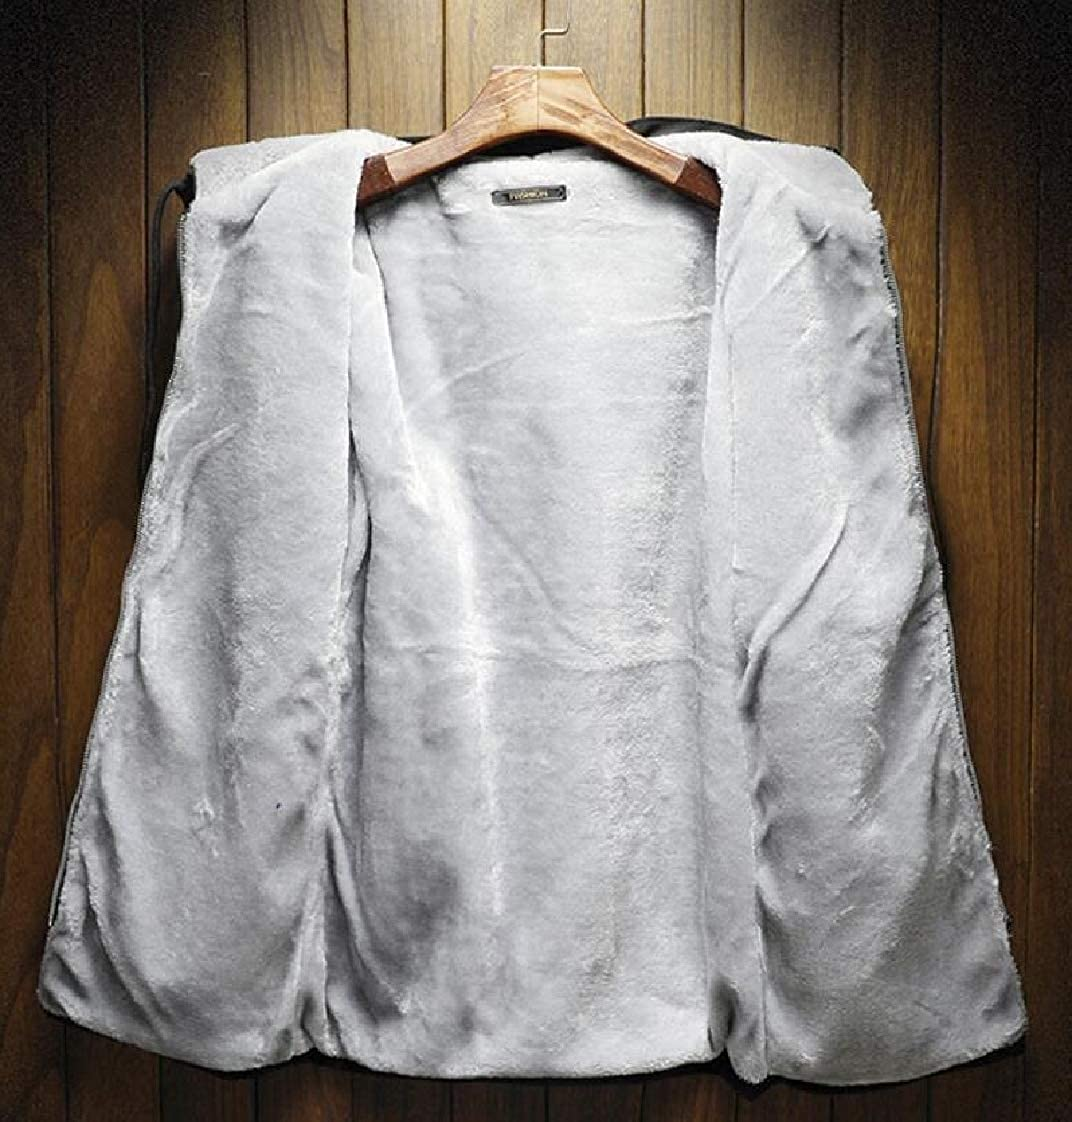 YYear Mens Hooded Linen Fleece Drawstring Warm Zipper Sweatshirt Jacket